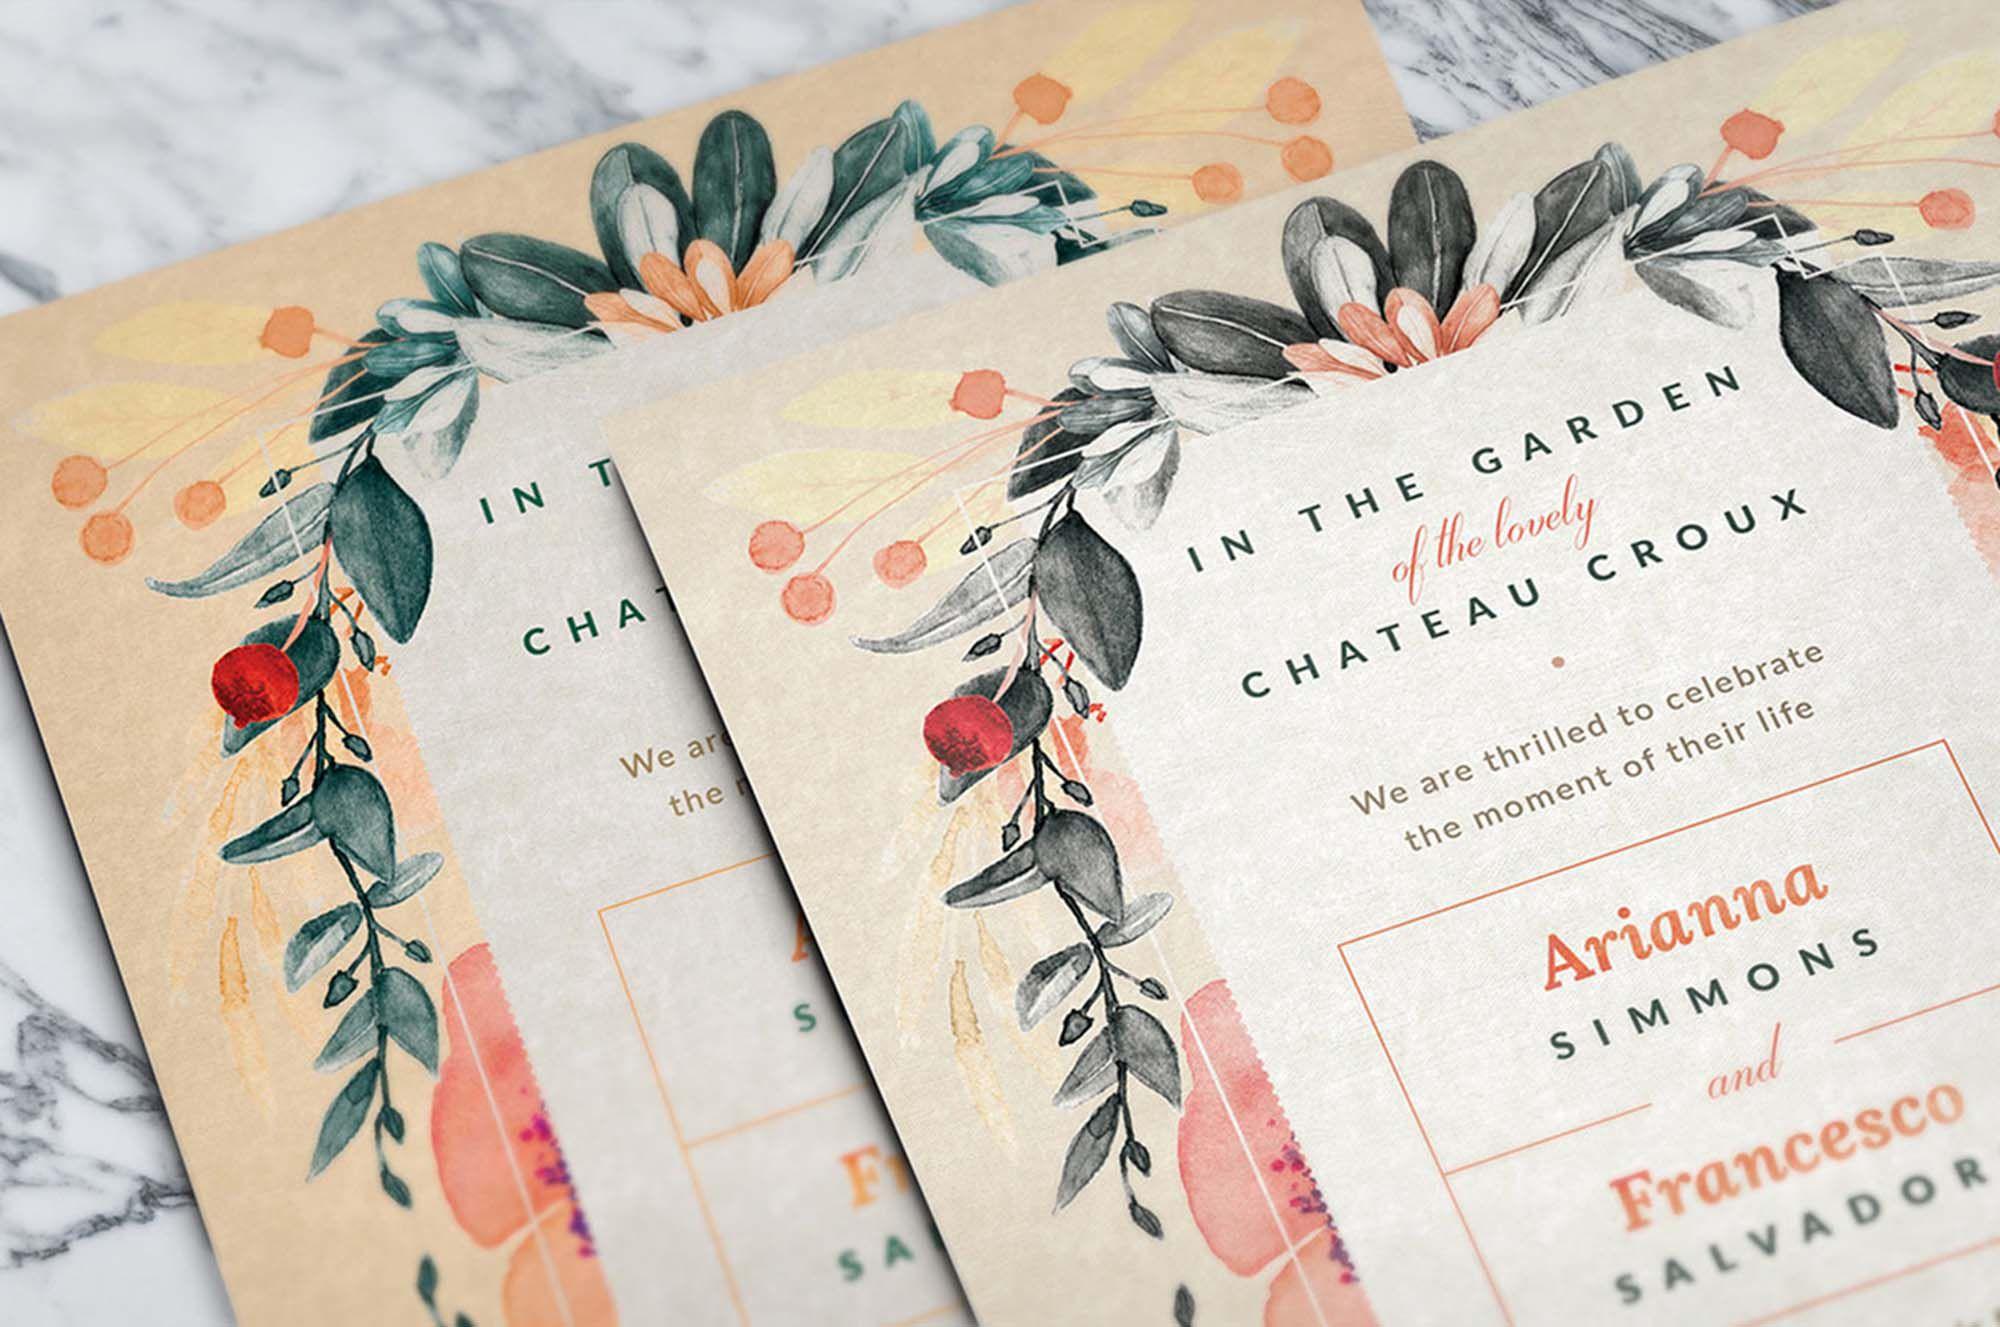 003 Phenomenal Photoshop Wedding Invitation Template Idea  Templates Hindu Psd Free Download CardFull